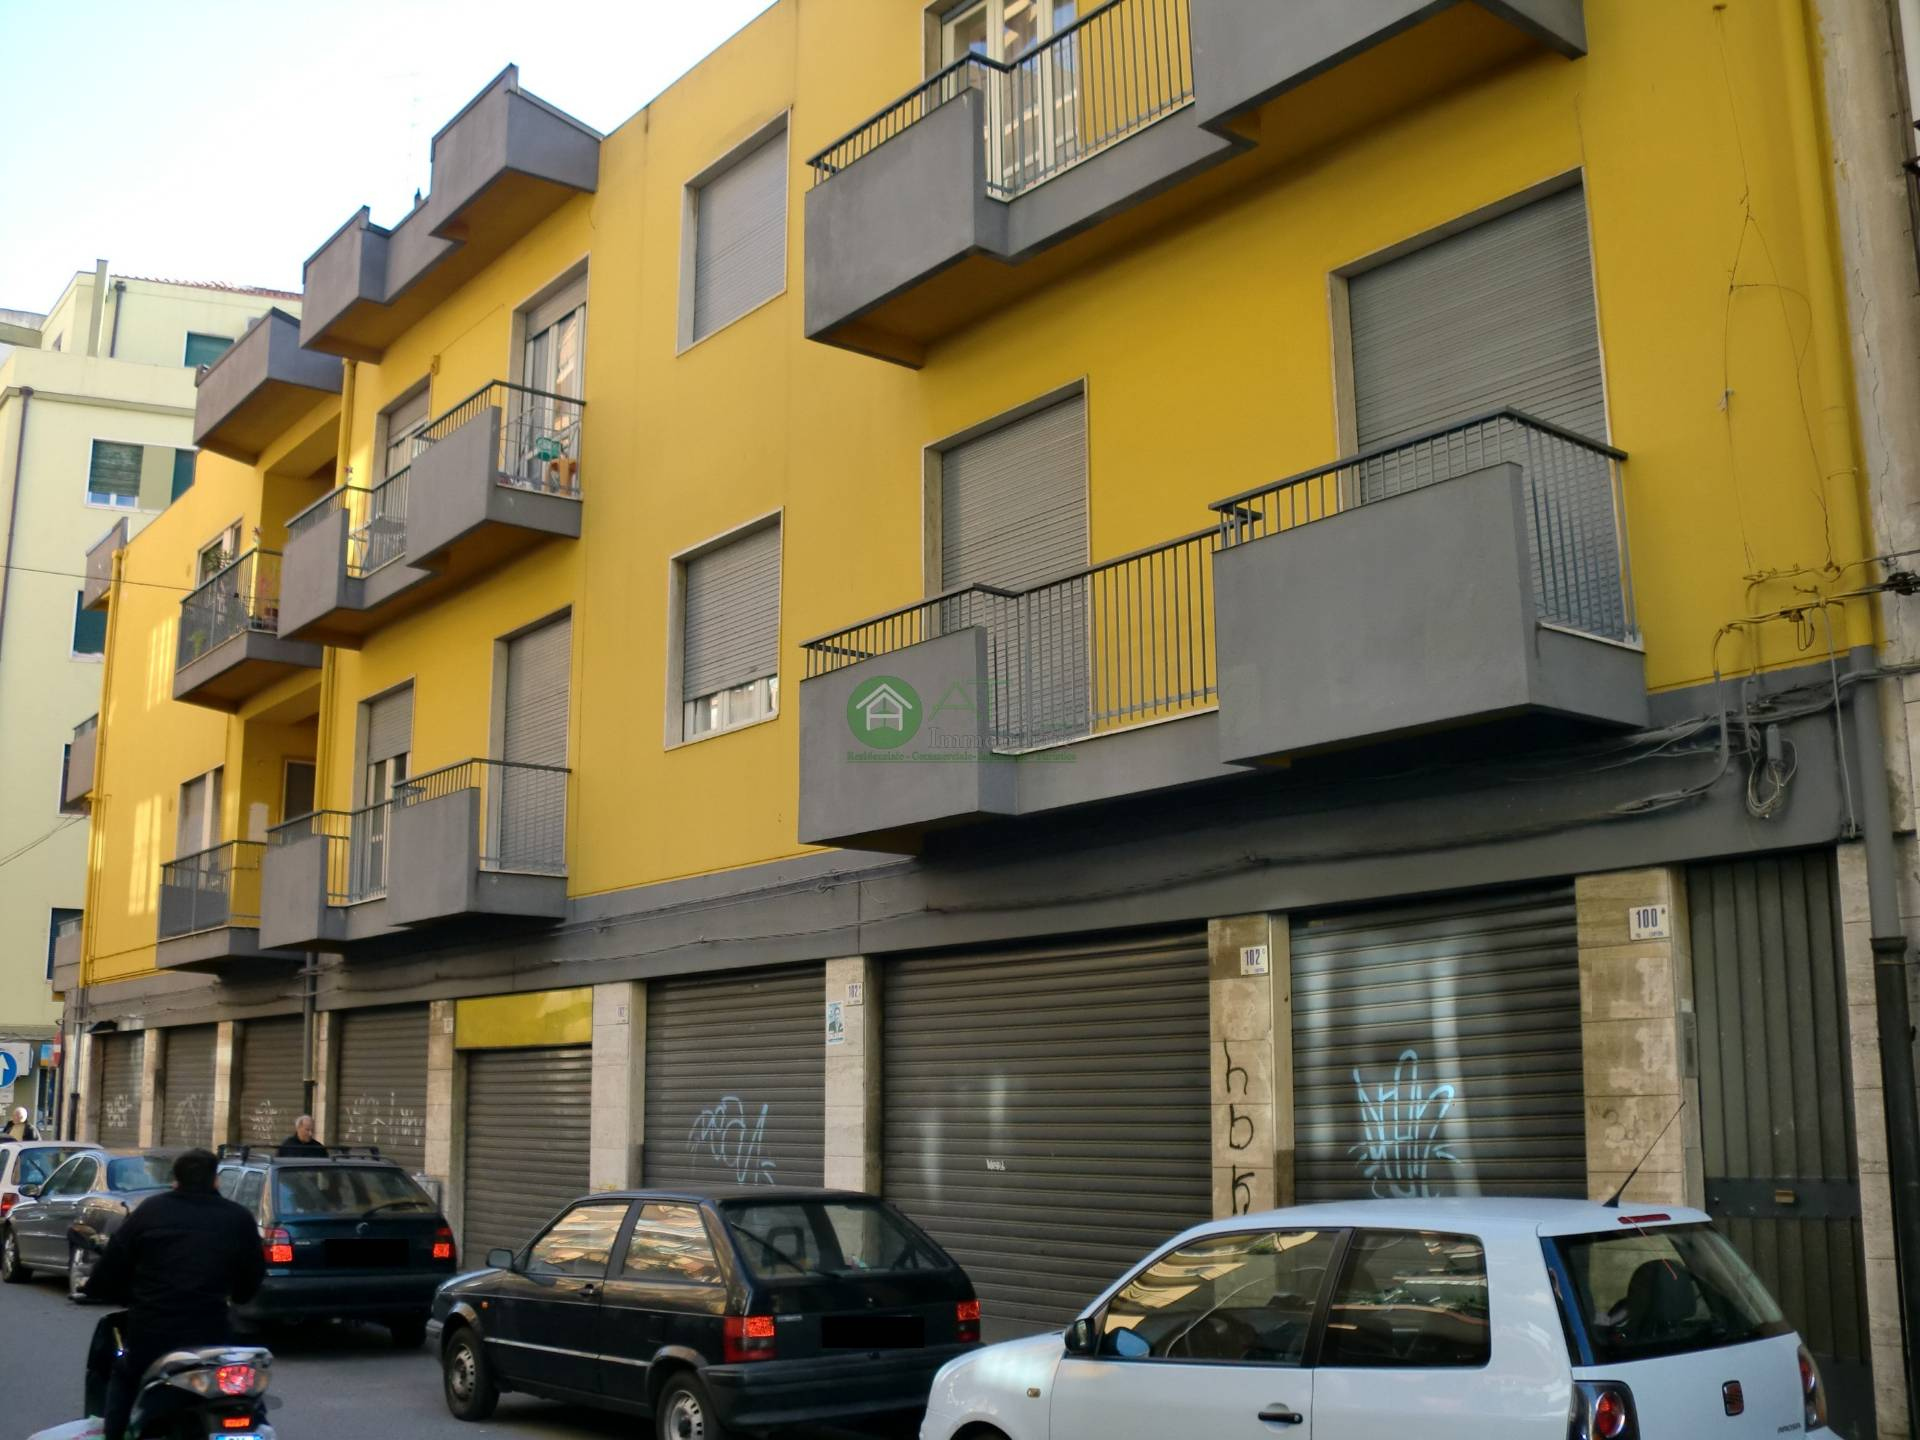 catania vendita quart: zona centro studio catania centro sas di corallo gaetana & c